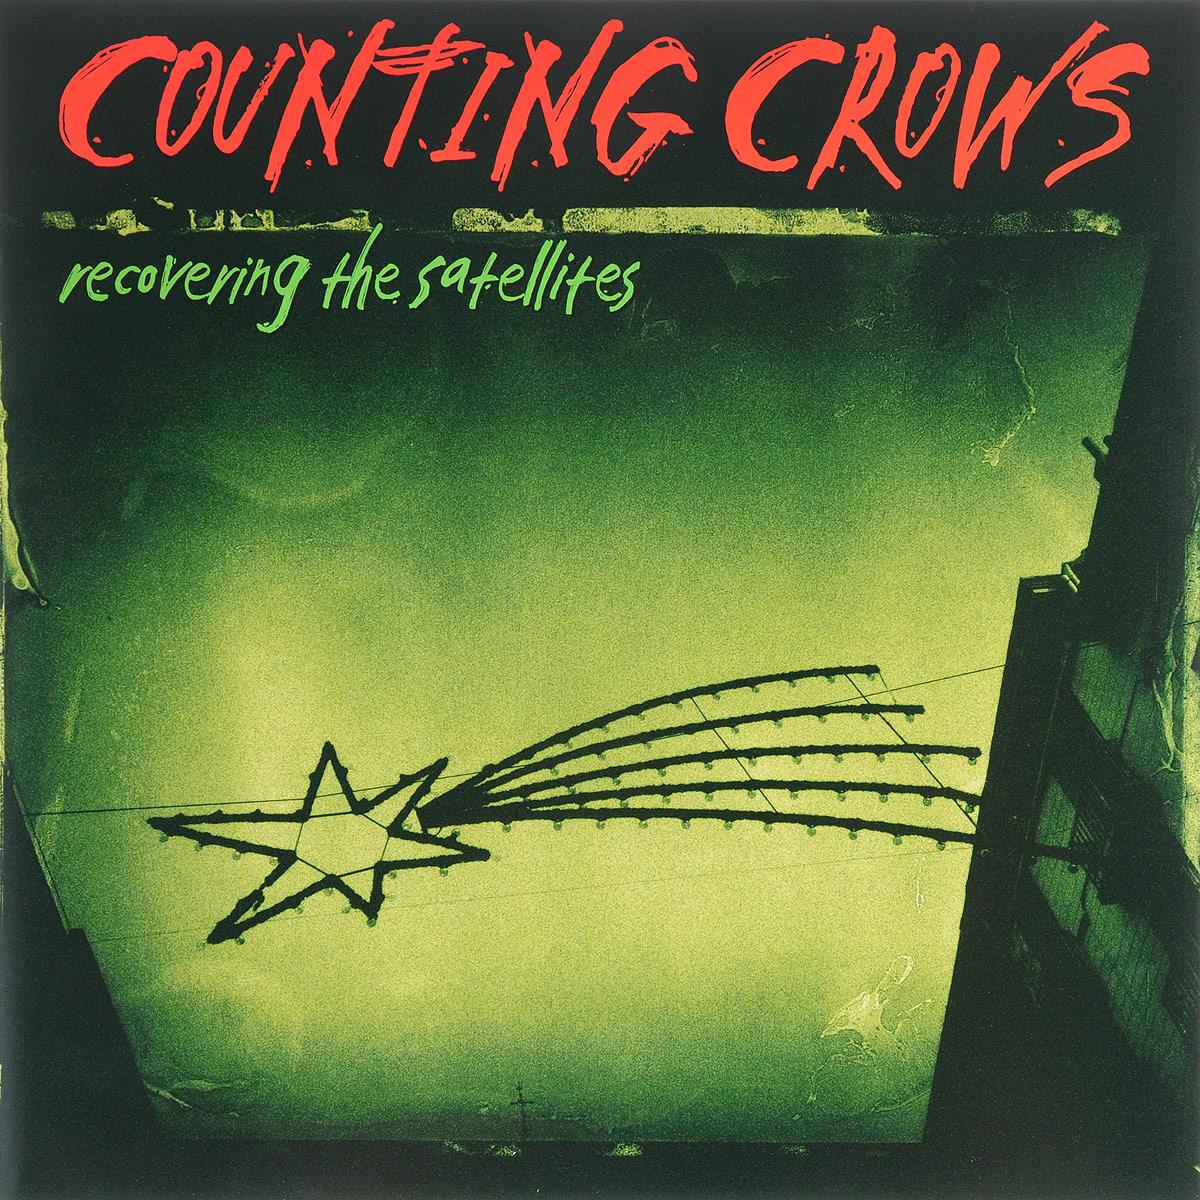 Counting Crows Counting Crows. Recovering The Satellites (2 LP) горнолыжные палки black crows black crows oxus желтый 130